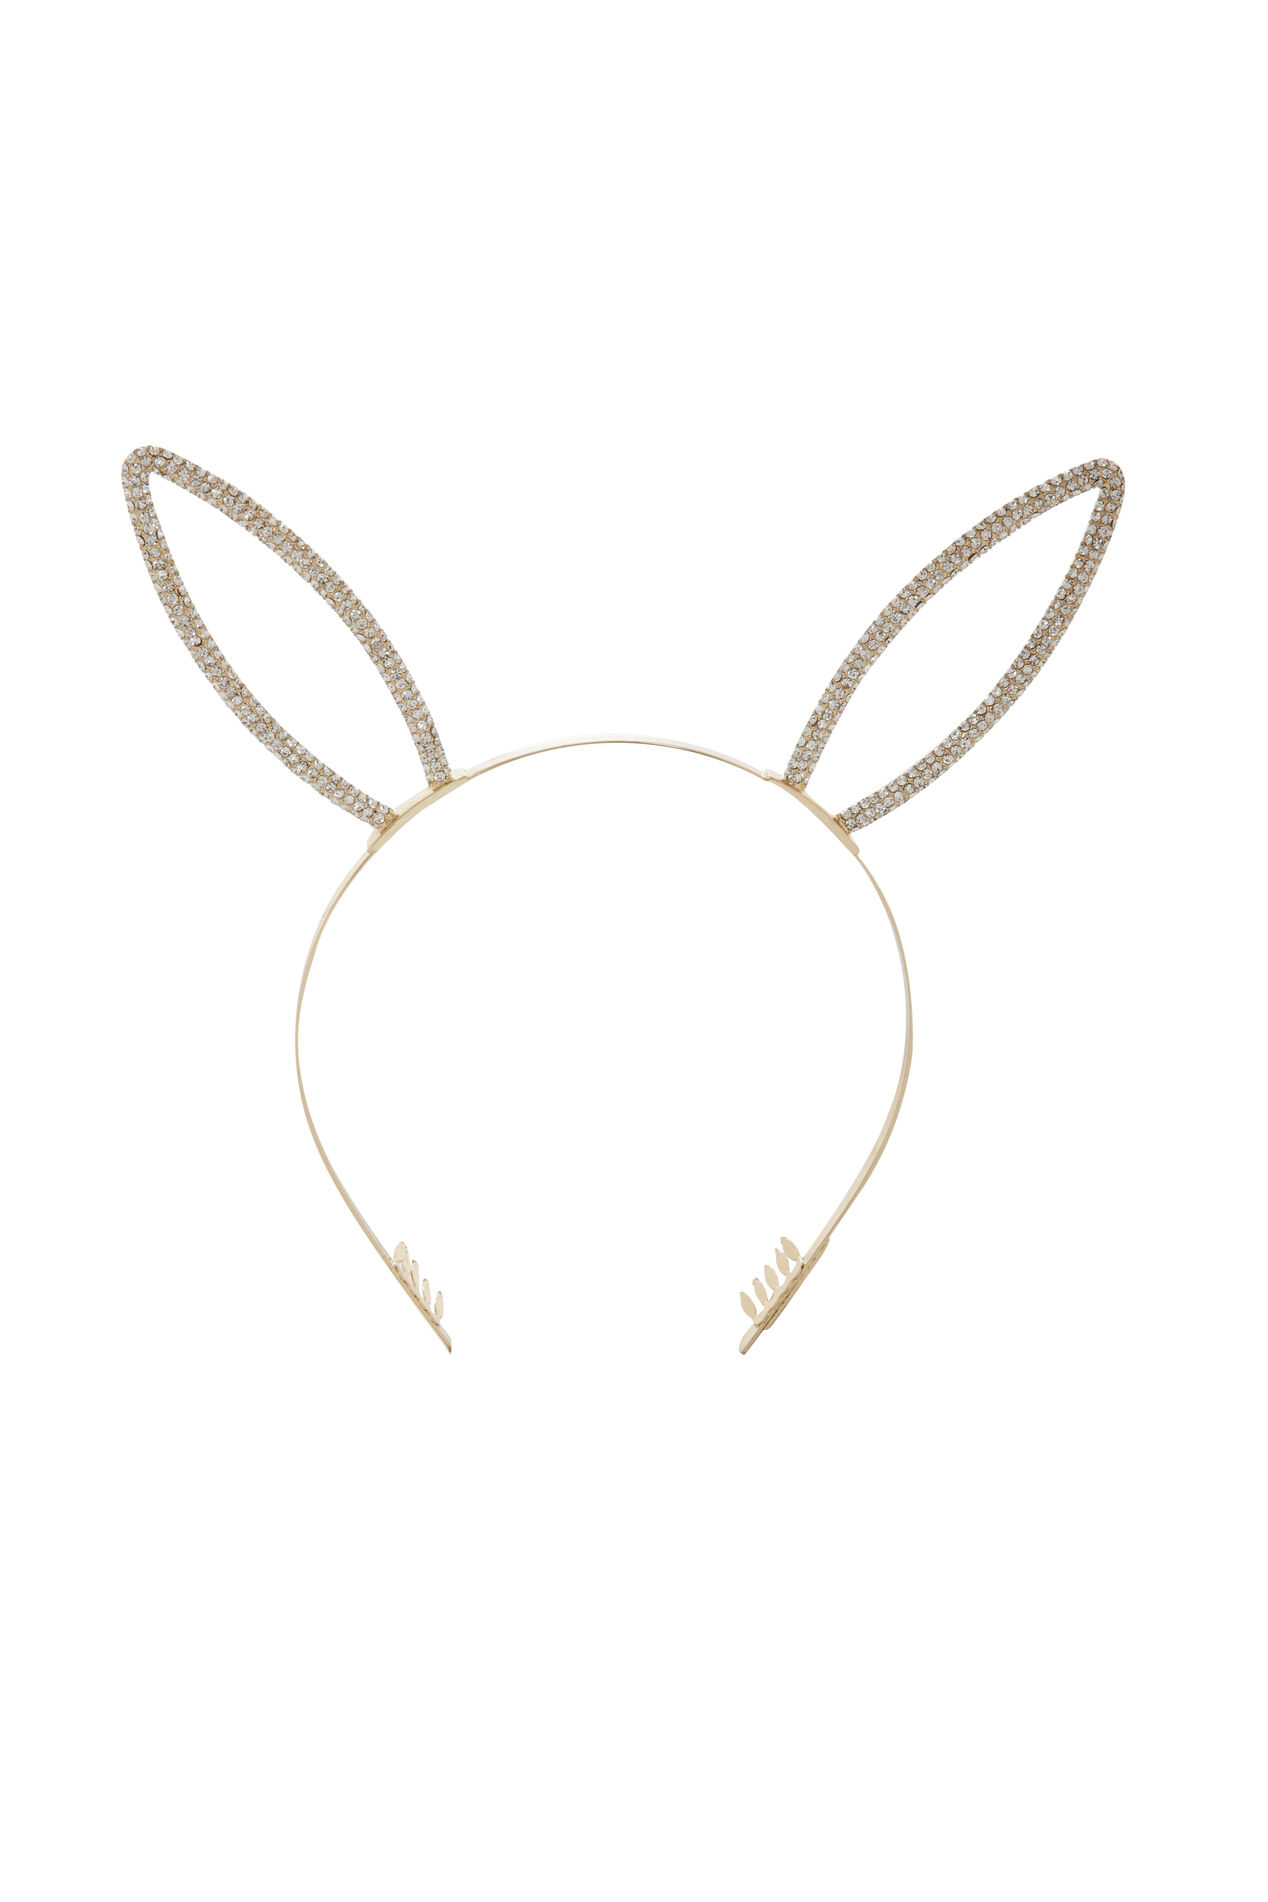 Pave Bunny Ears Headband